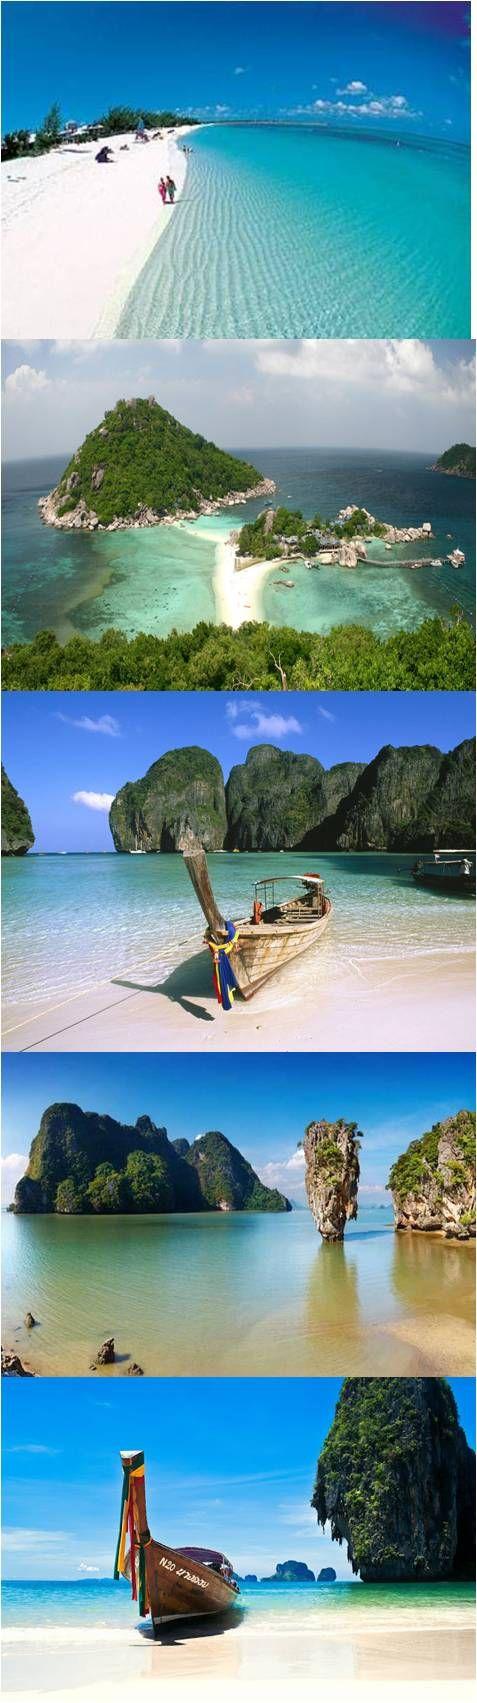 4 Days Thailand Itinerary